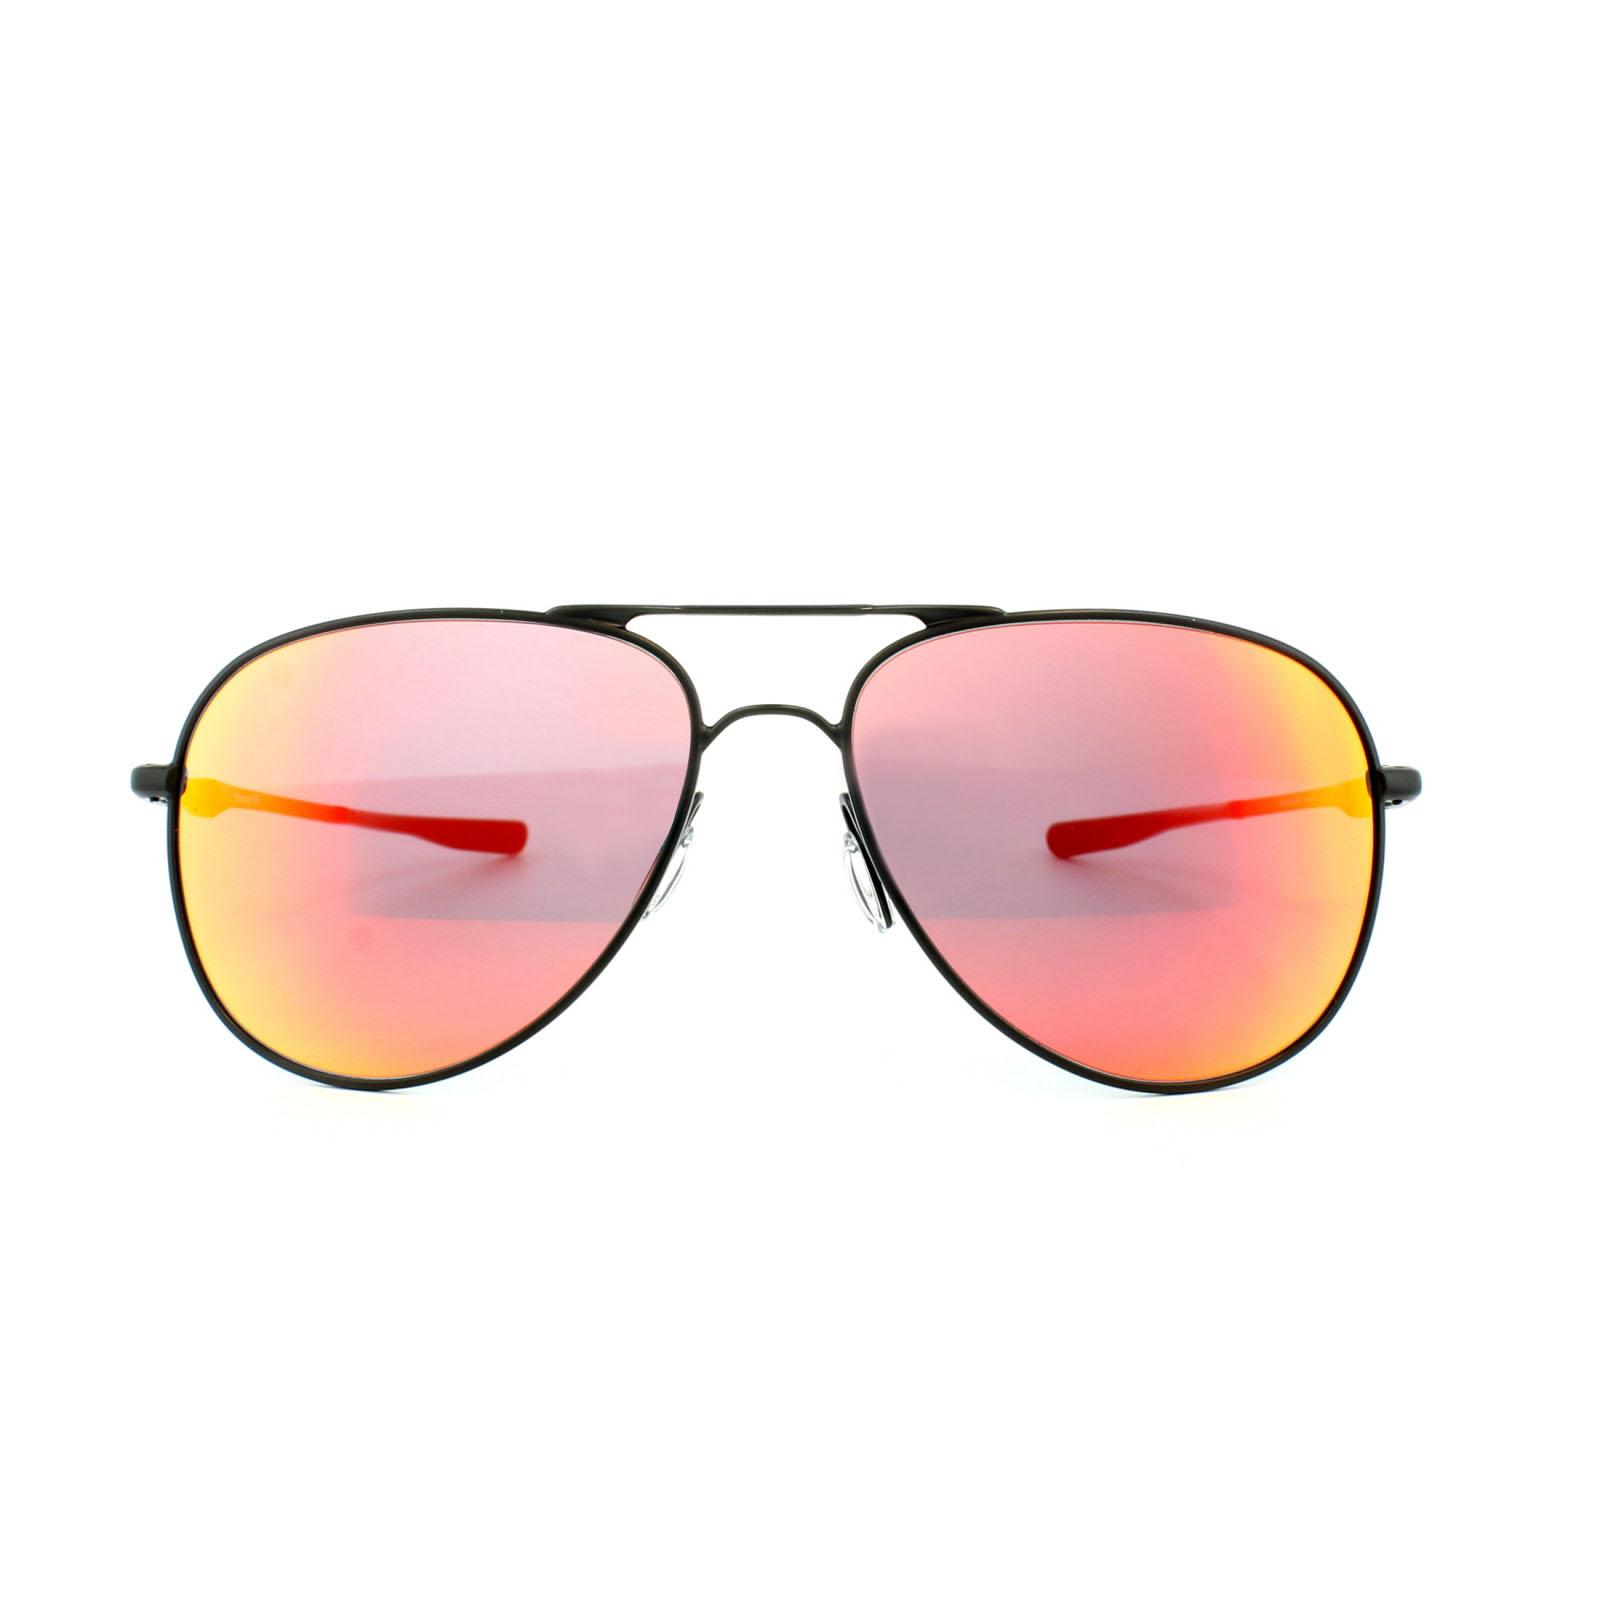 5f0c6e6d87 Sentinel Oakley Sunglasses Elmont M OO4119-04 Satin Black Ruby Iridium